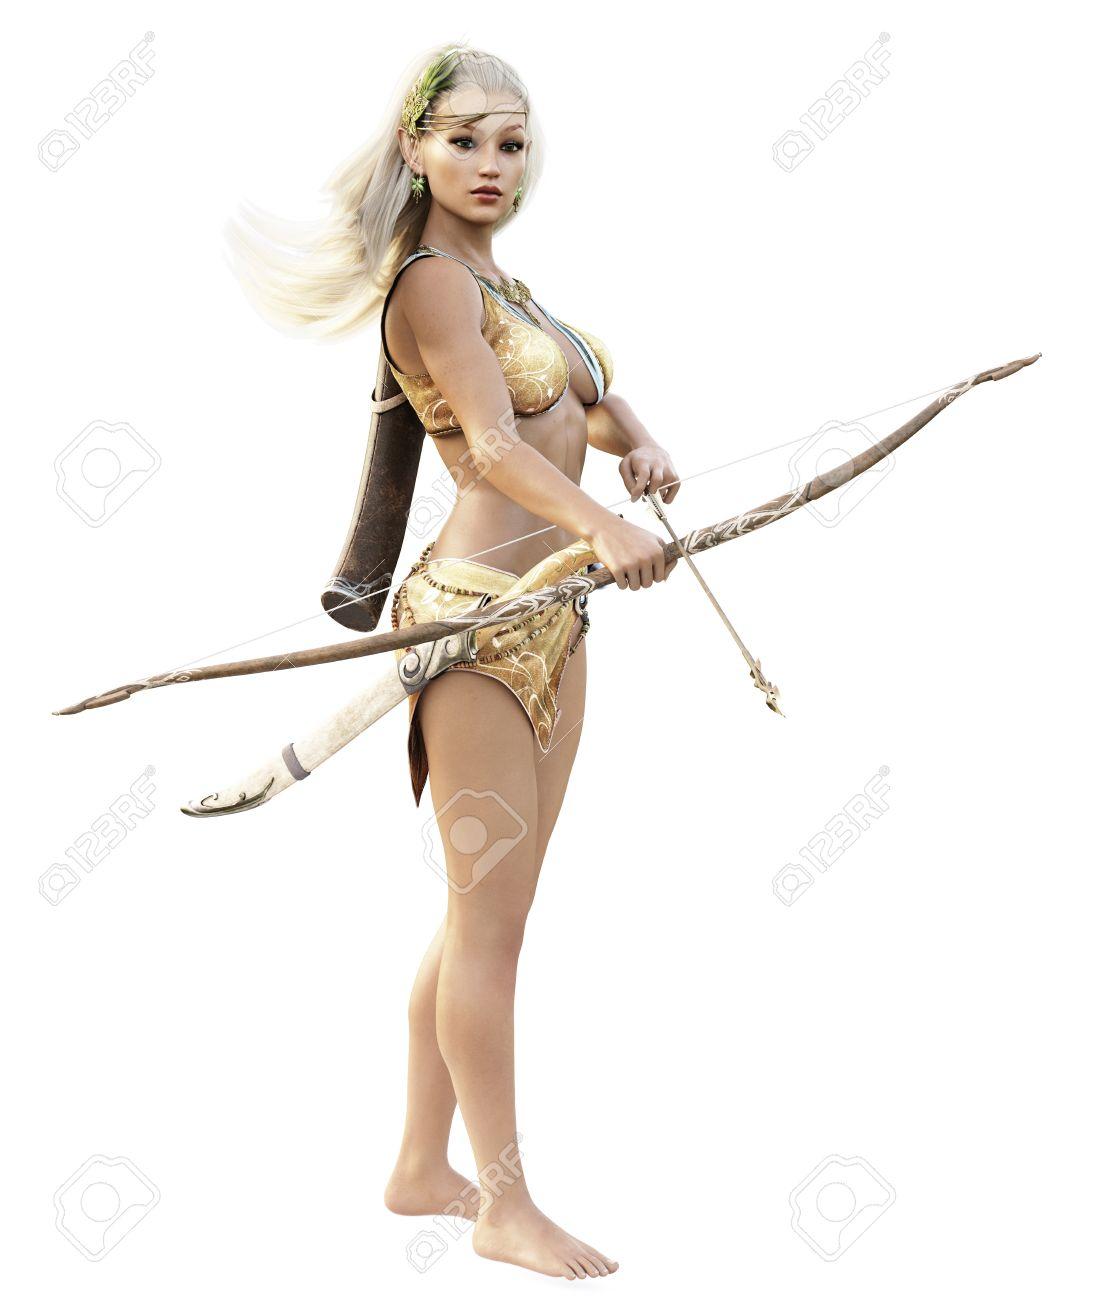 Blonde girl shooting bow hasidic